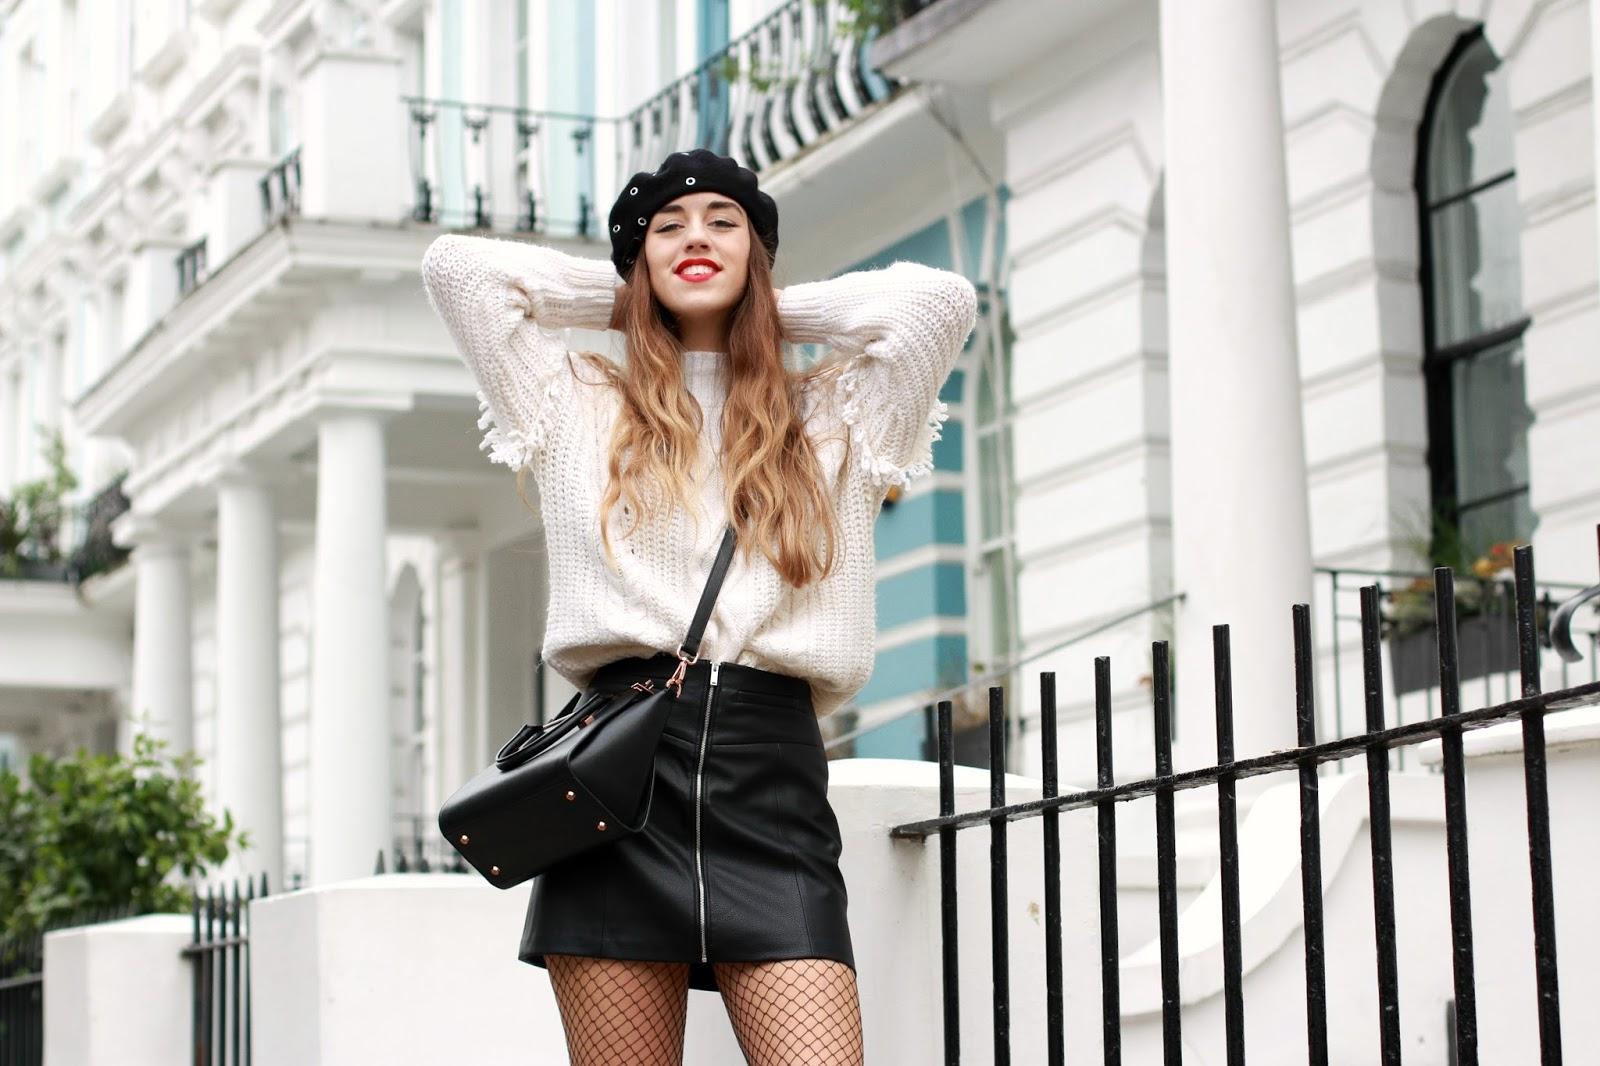 alexandra-lauclair-alex-fashion-break-blog-mode-tendances-look-inspiration-mode